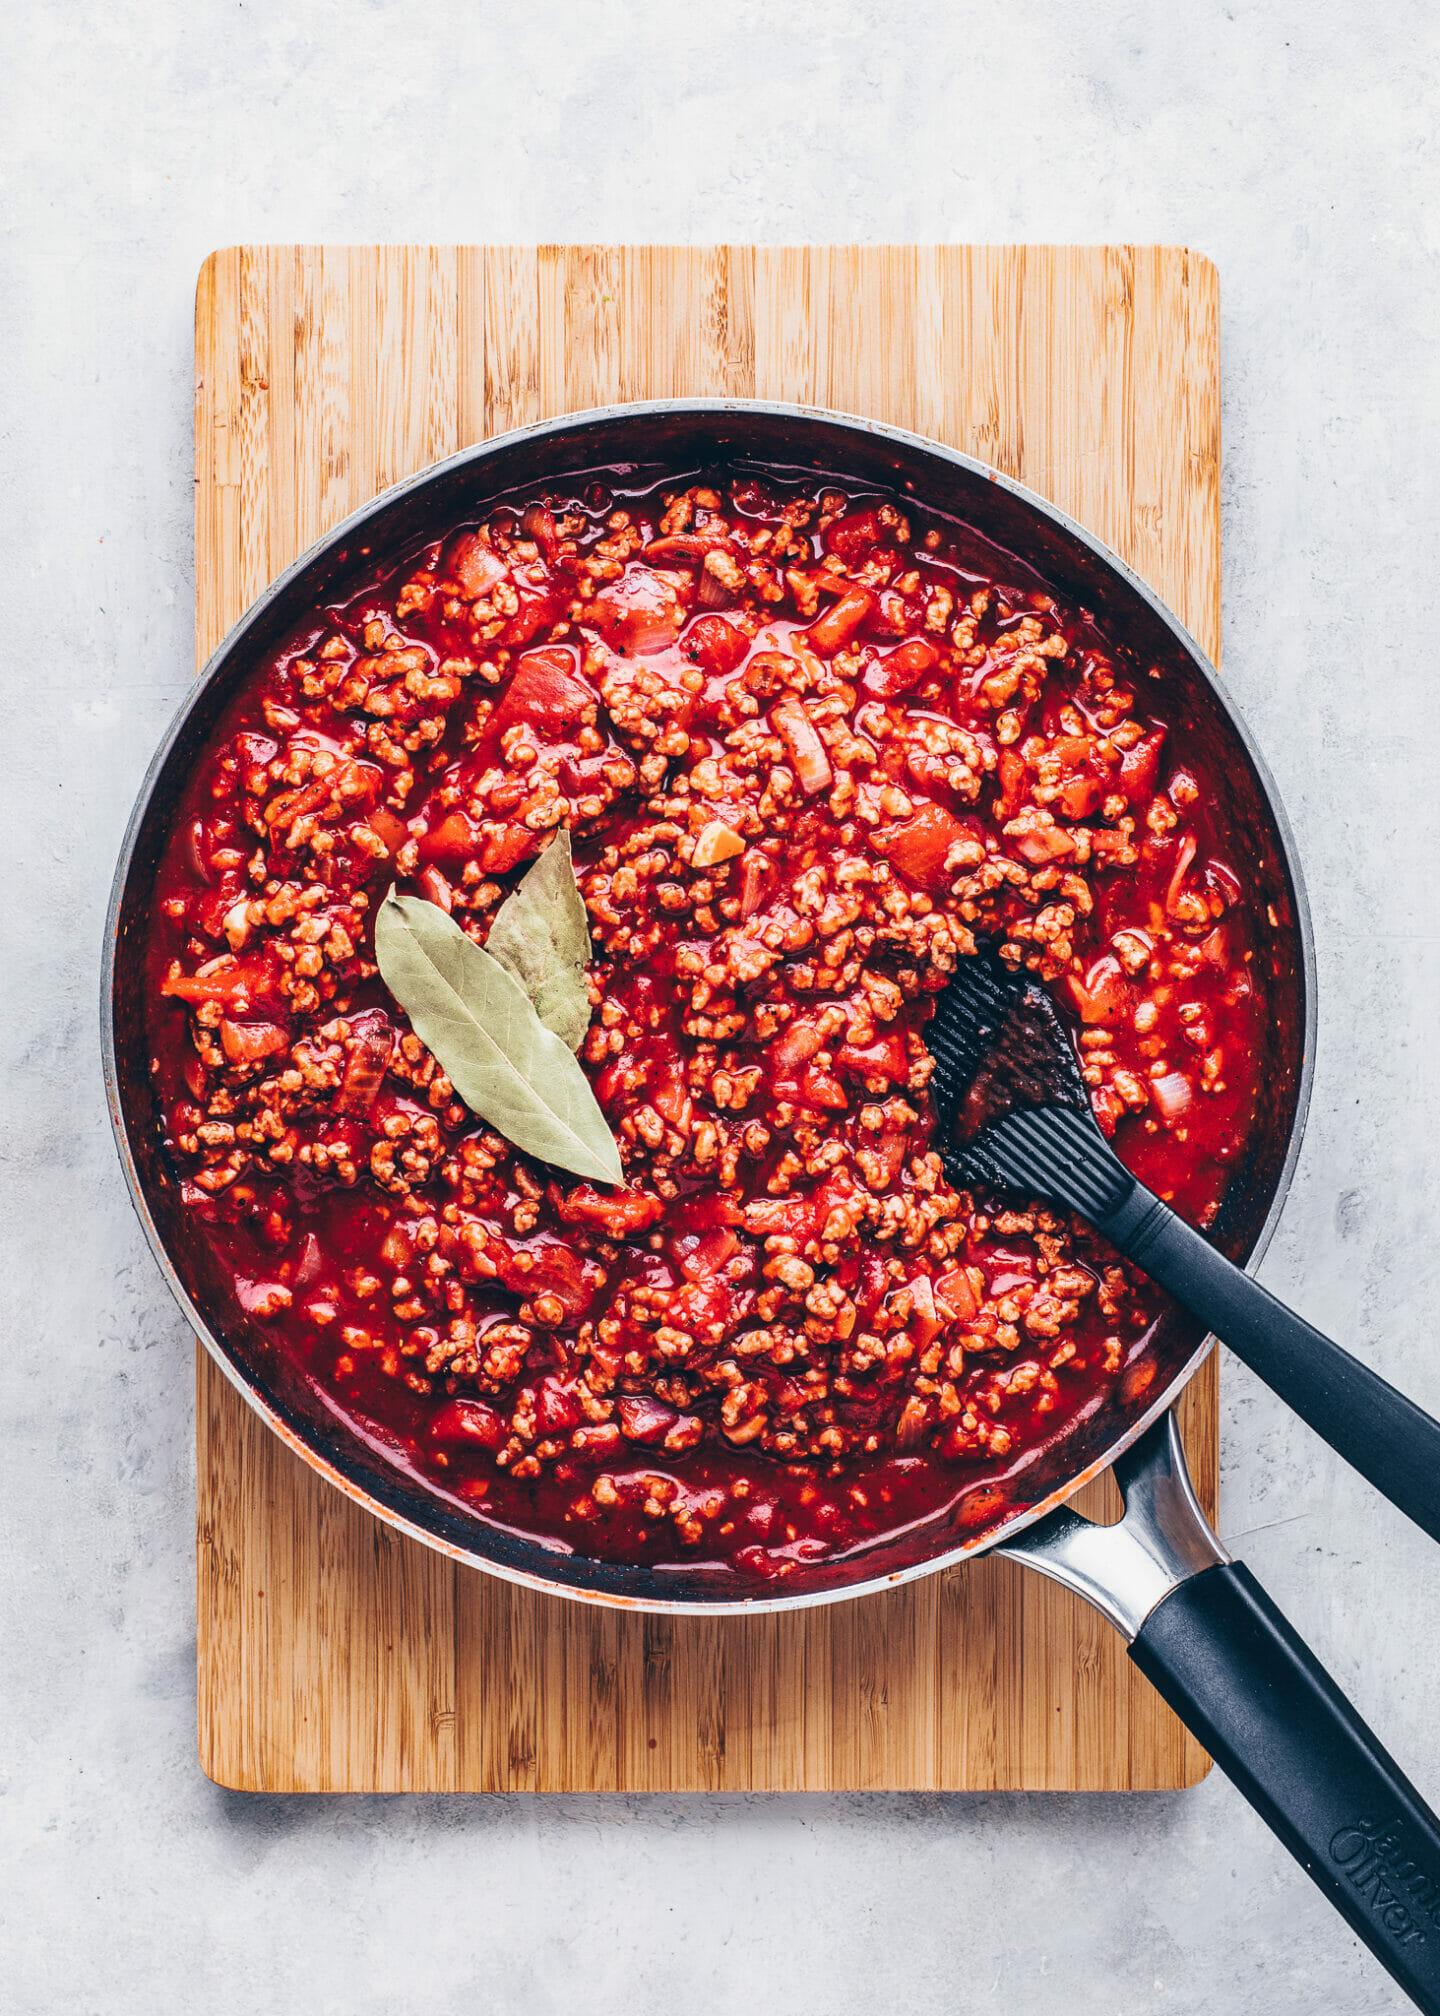 Vegan Tomato Meat Sauce for Moussaka and Lasagna